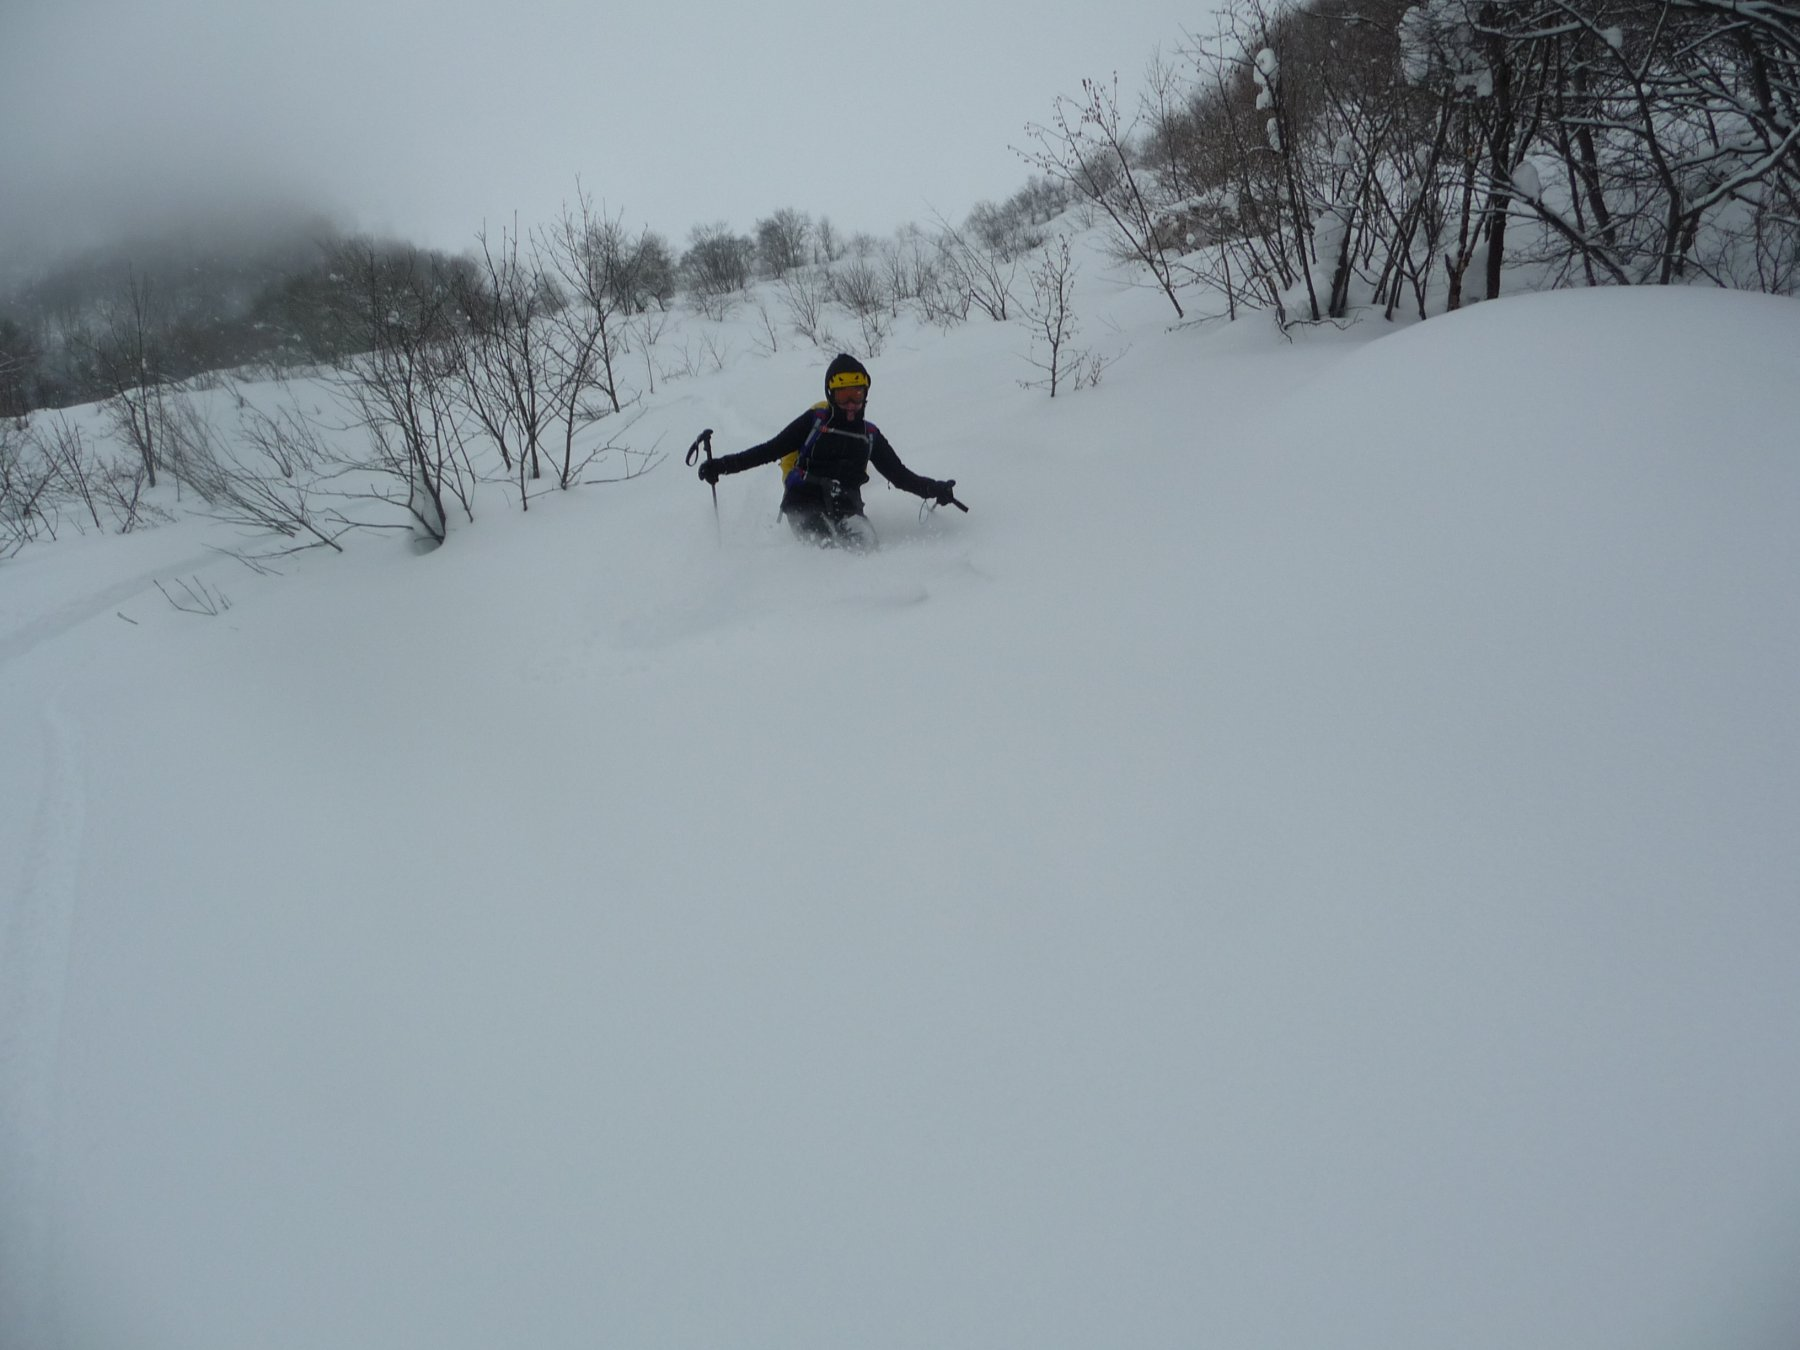 Tanta neve ma scorrevole